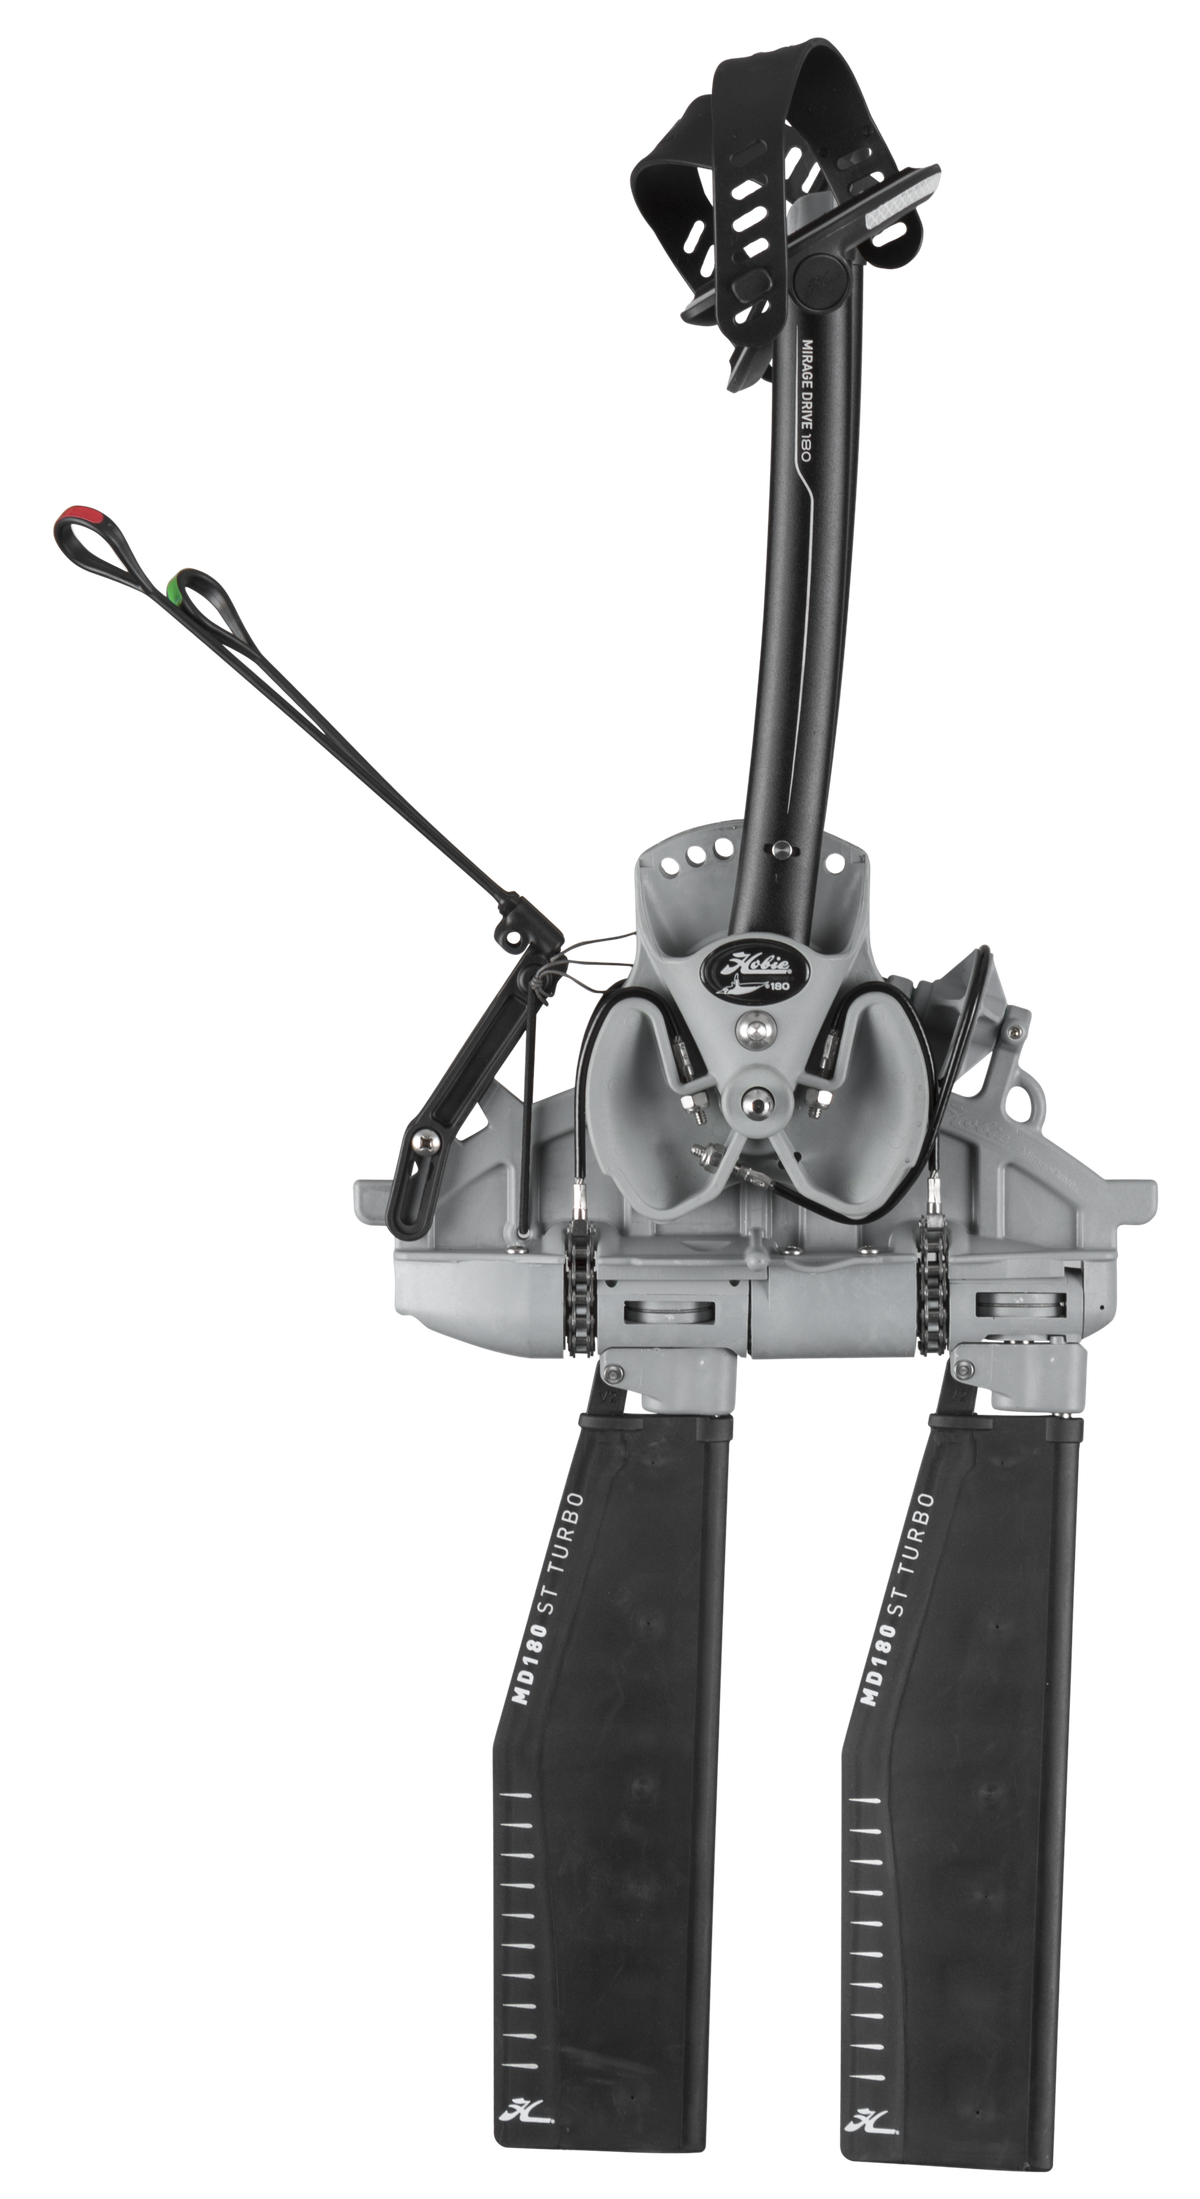 The Hobie MirageDrive 180 - Side Profile Full